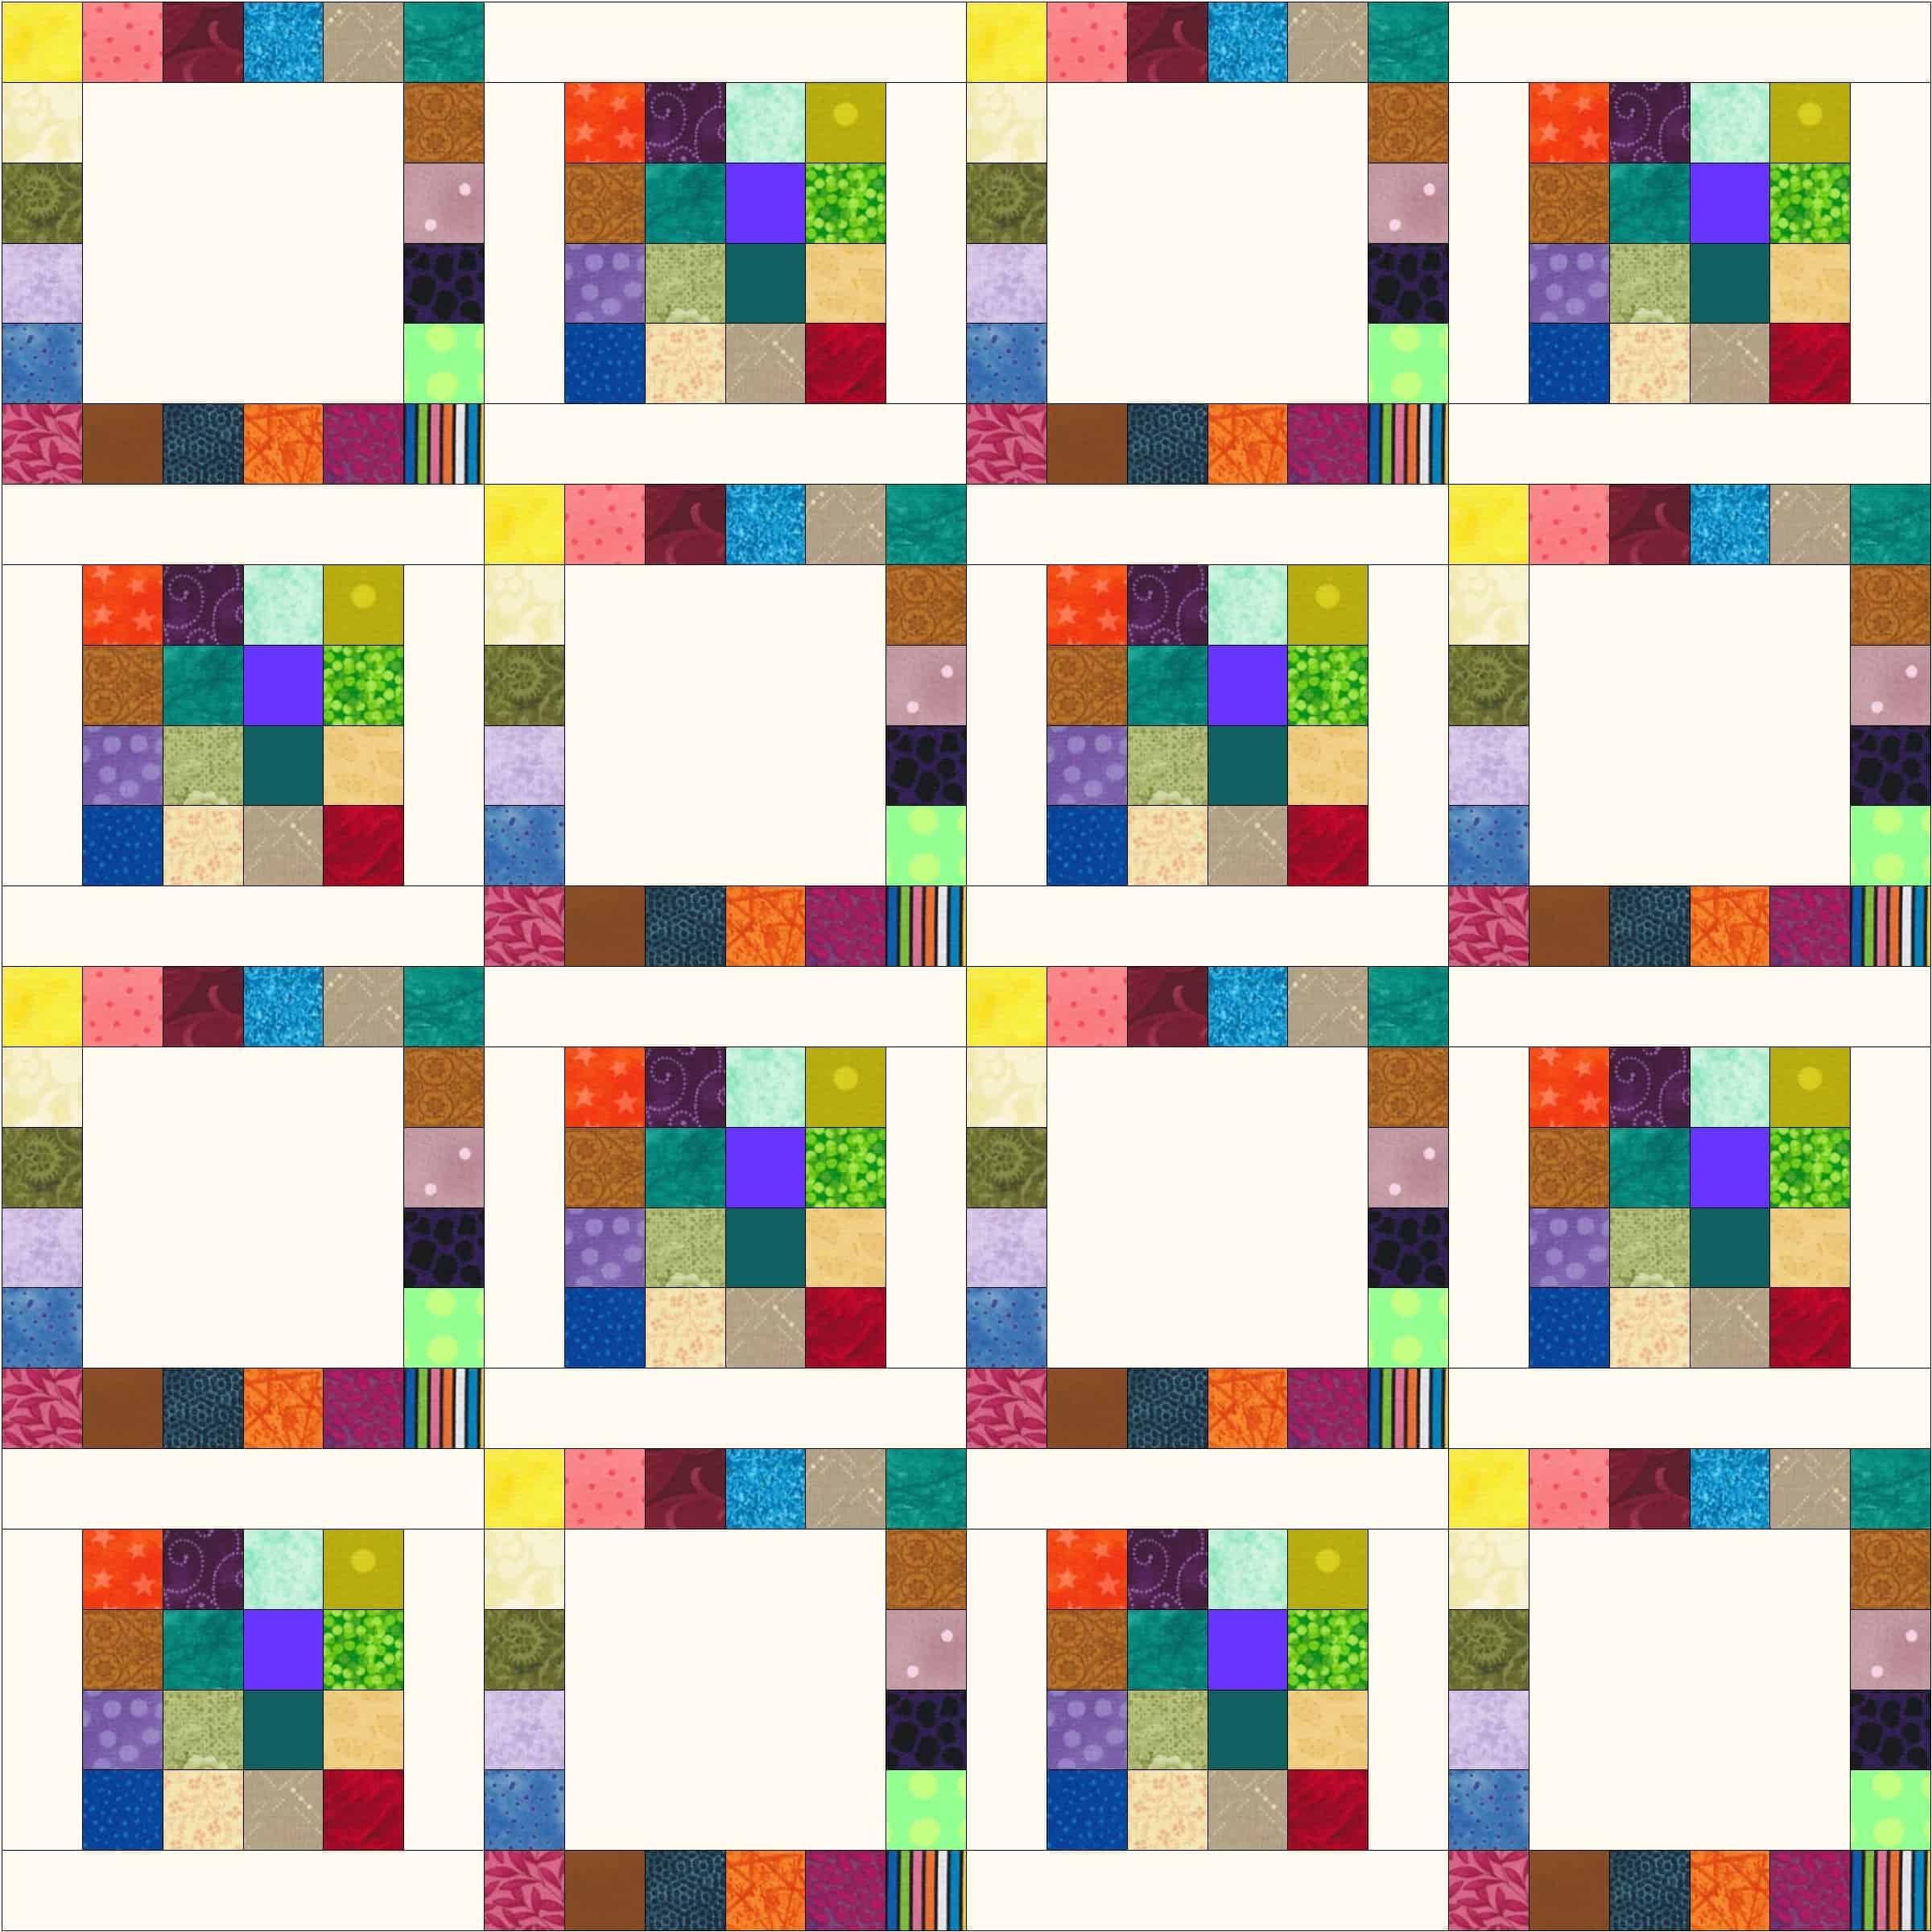 colorblock quilt design  u2013 artquiltmaker blog